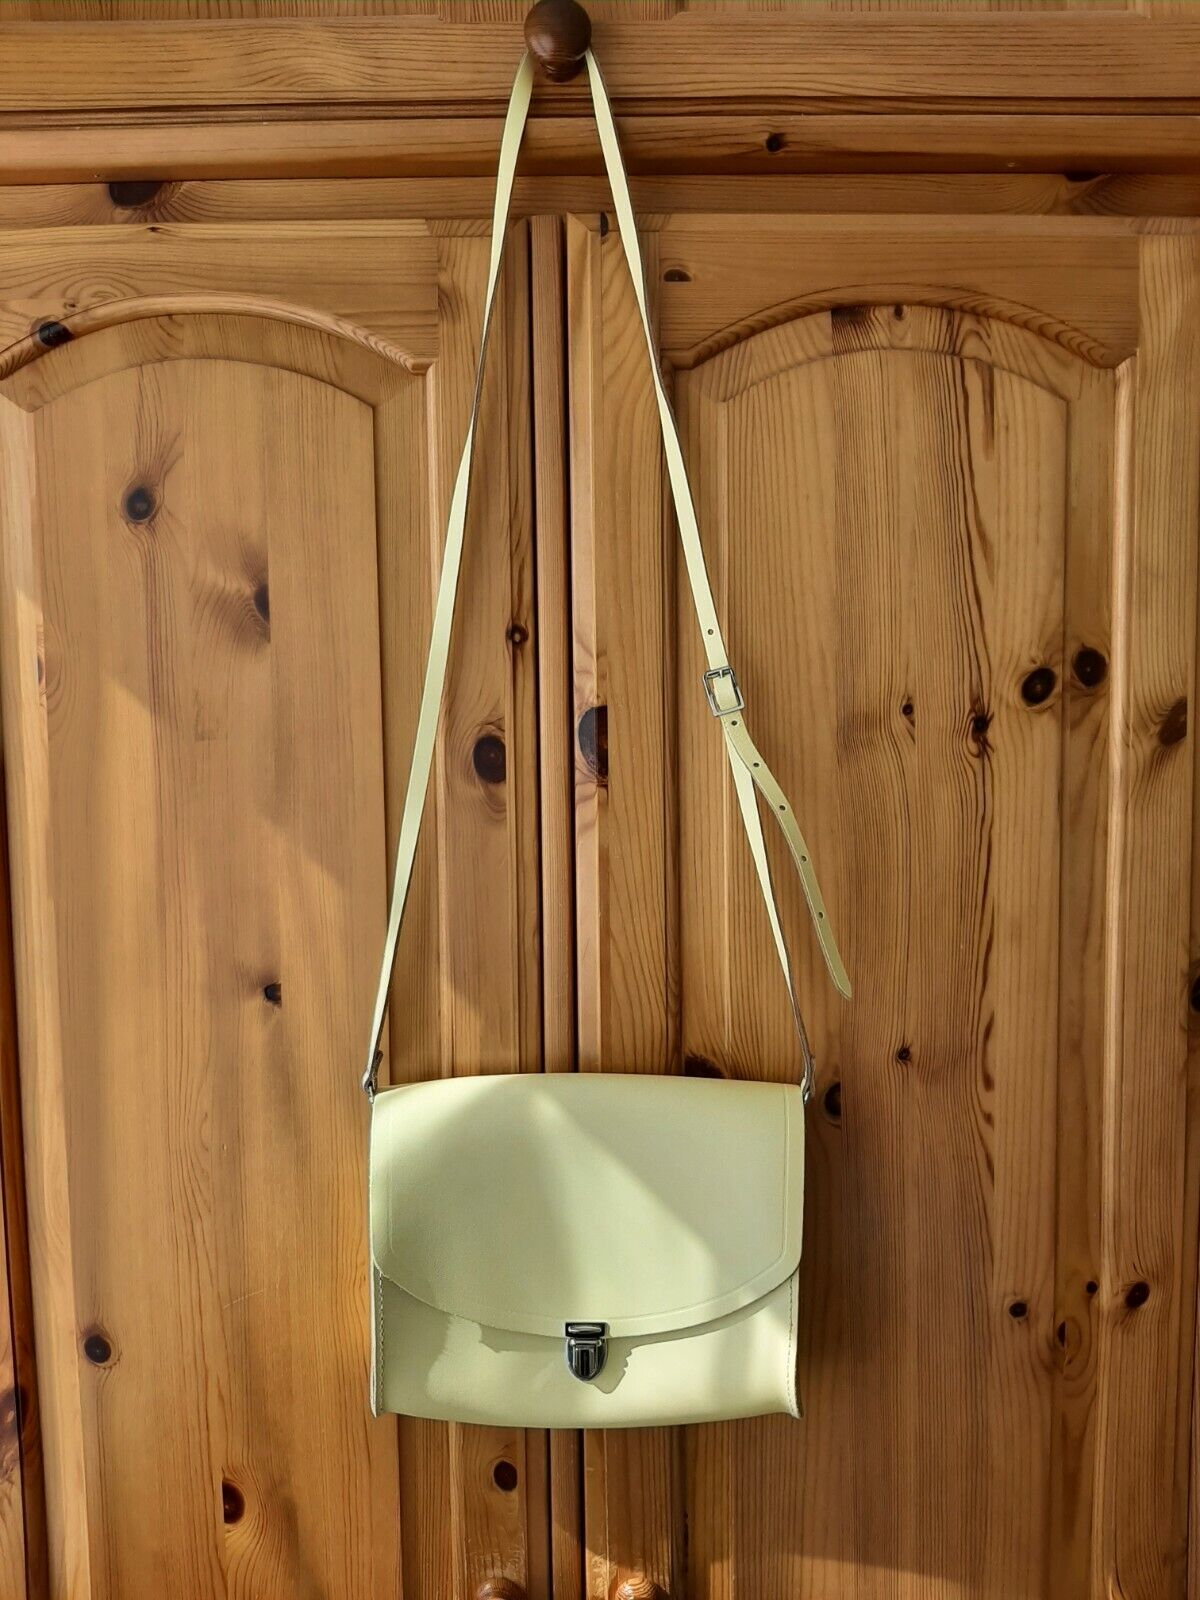 The Cambridge Satchel Company Leather Push Lock Bag In Lemon. Size L.